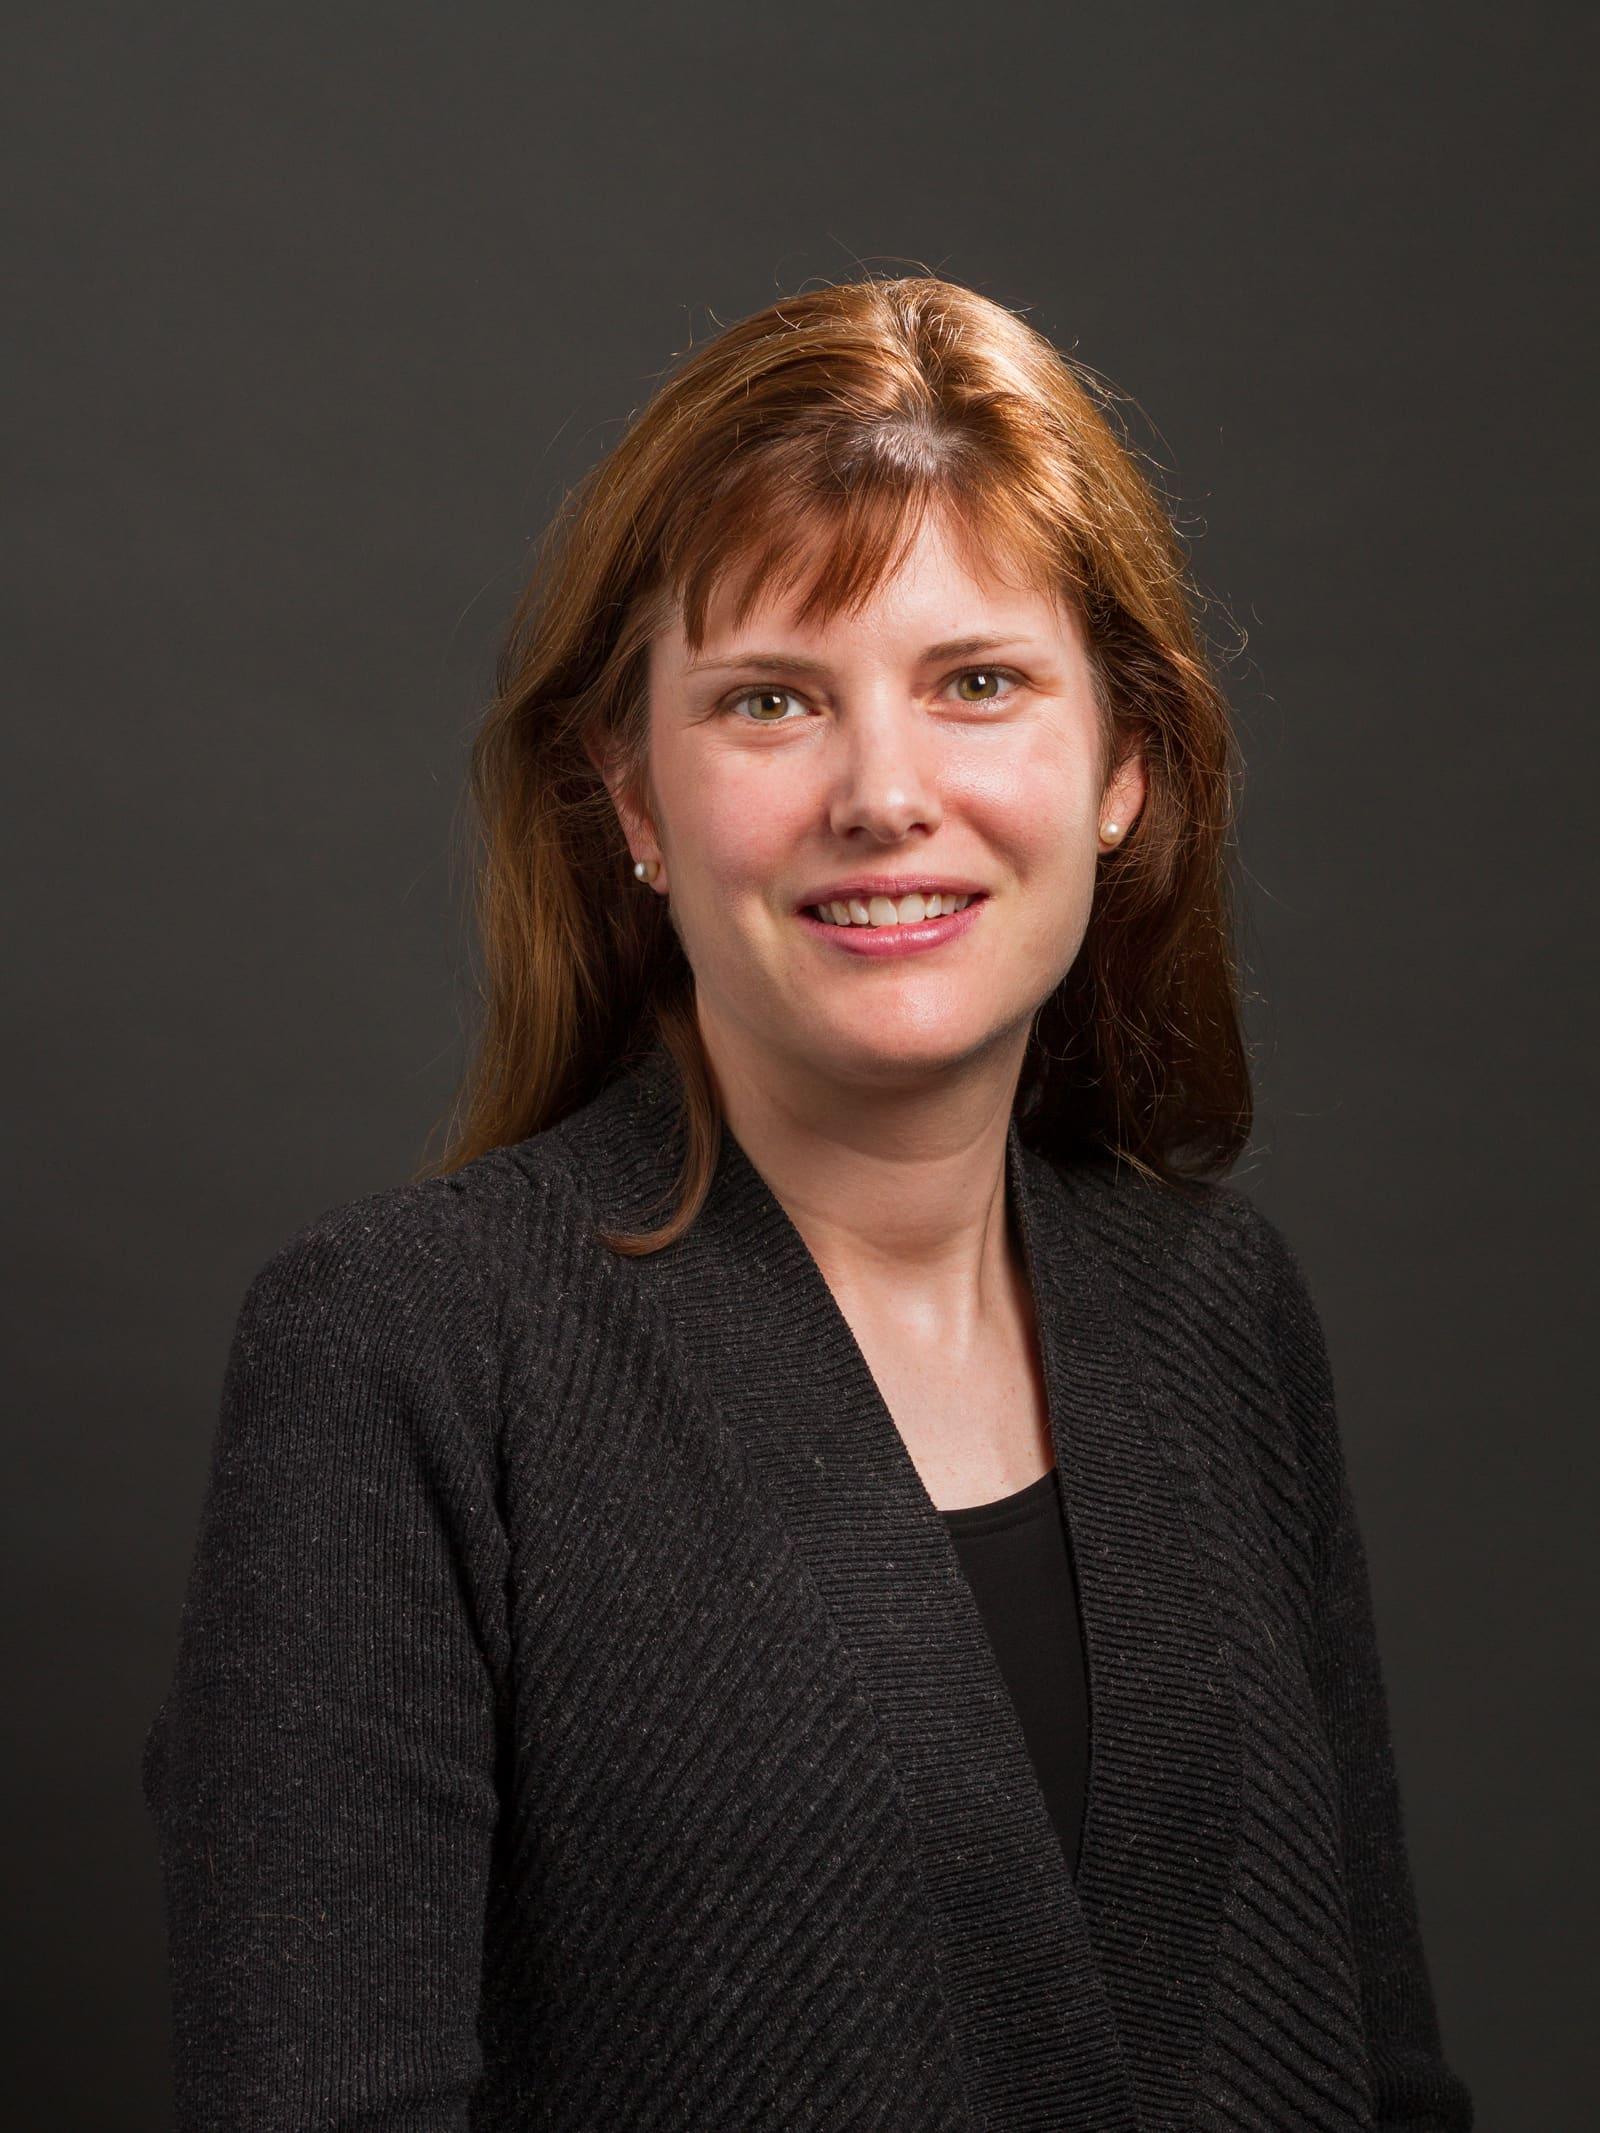 Christin A. Knowlton